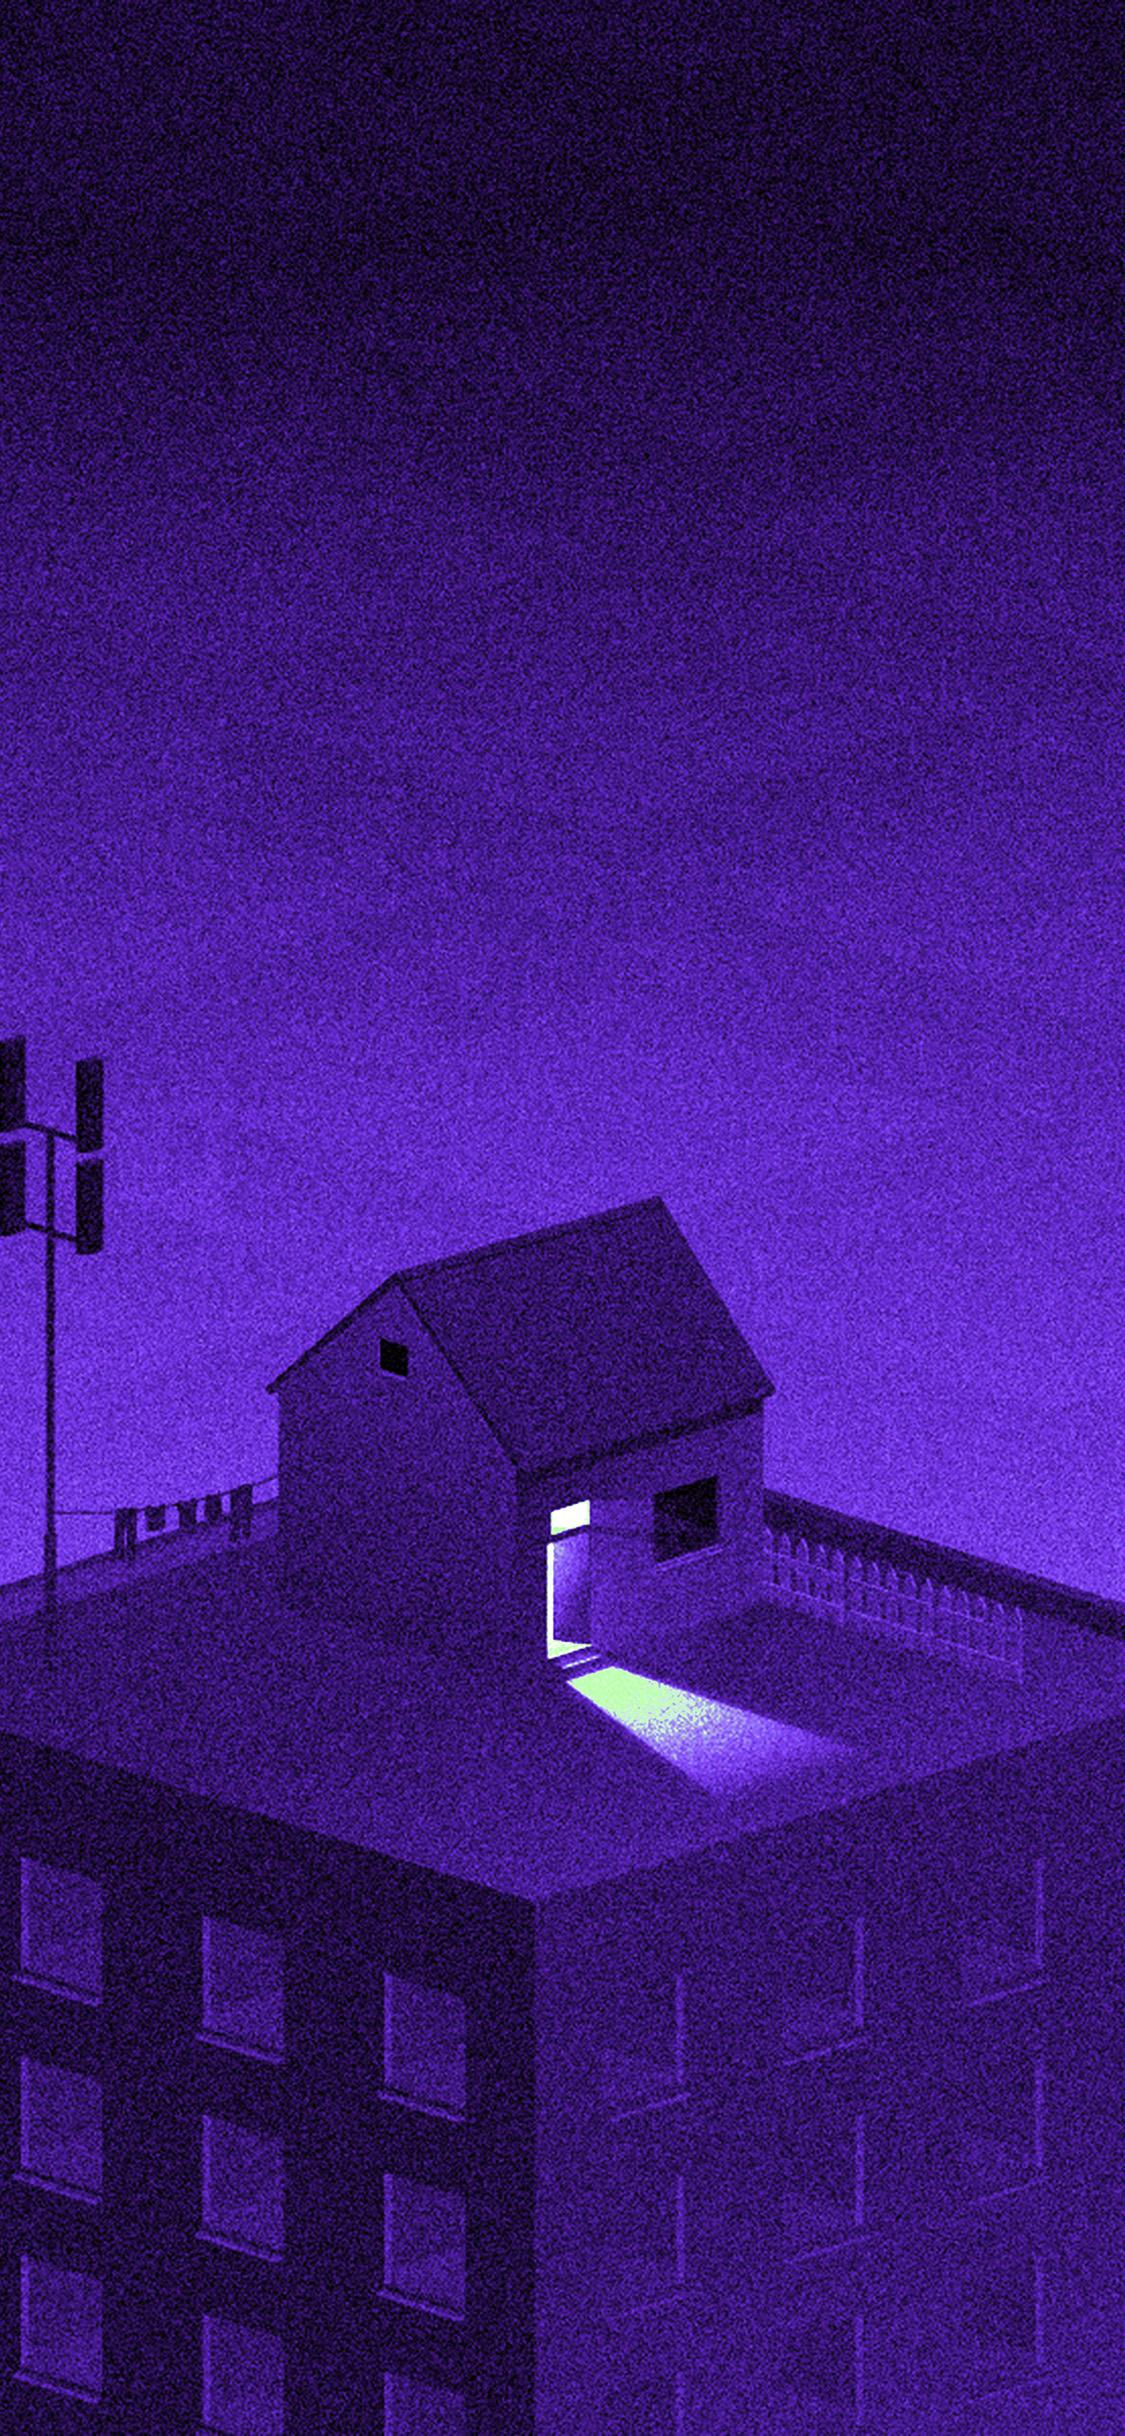 iPhonexpapers.com-Apple-iPhone-wallpaper-bi85-illust-purple-city-home-dot-art